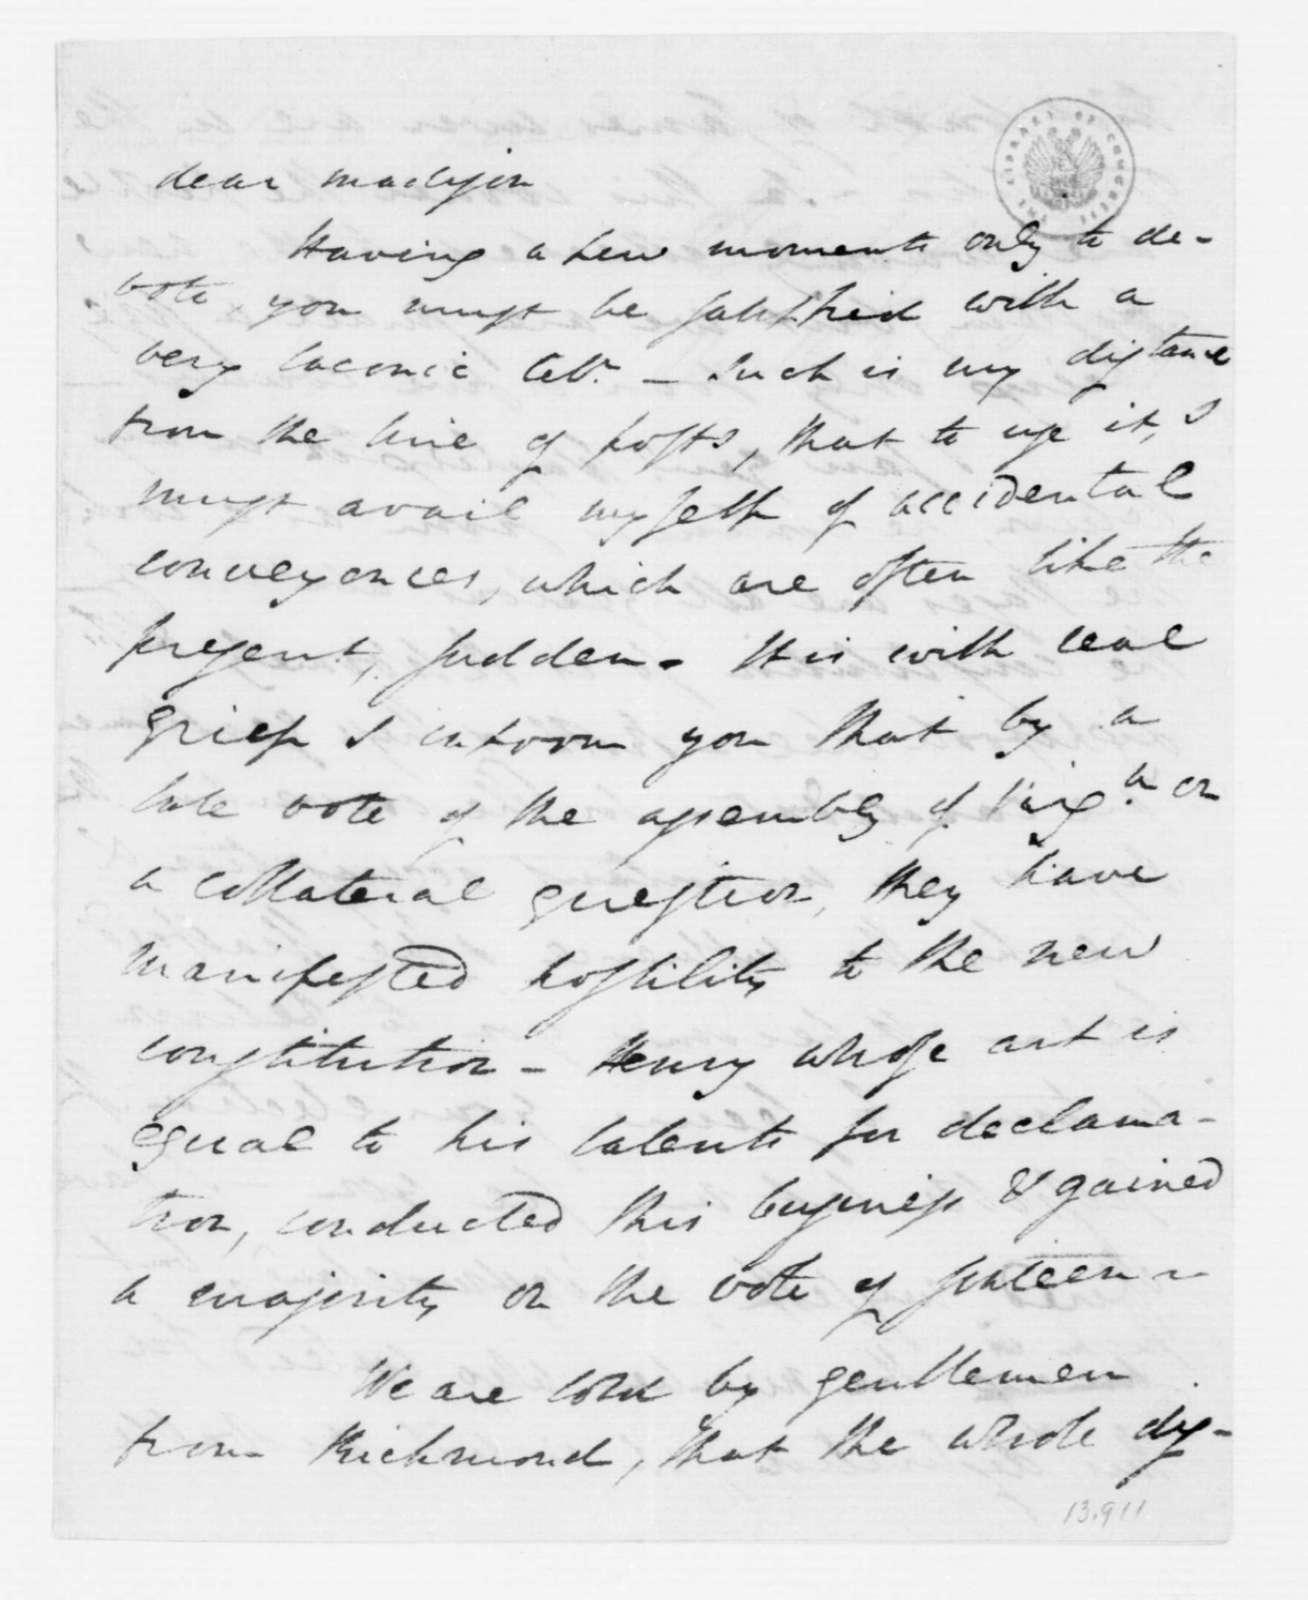 Henry Lee to James Madison, December 7, 1787.